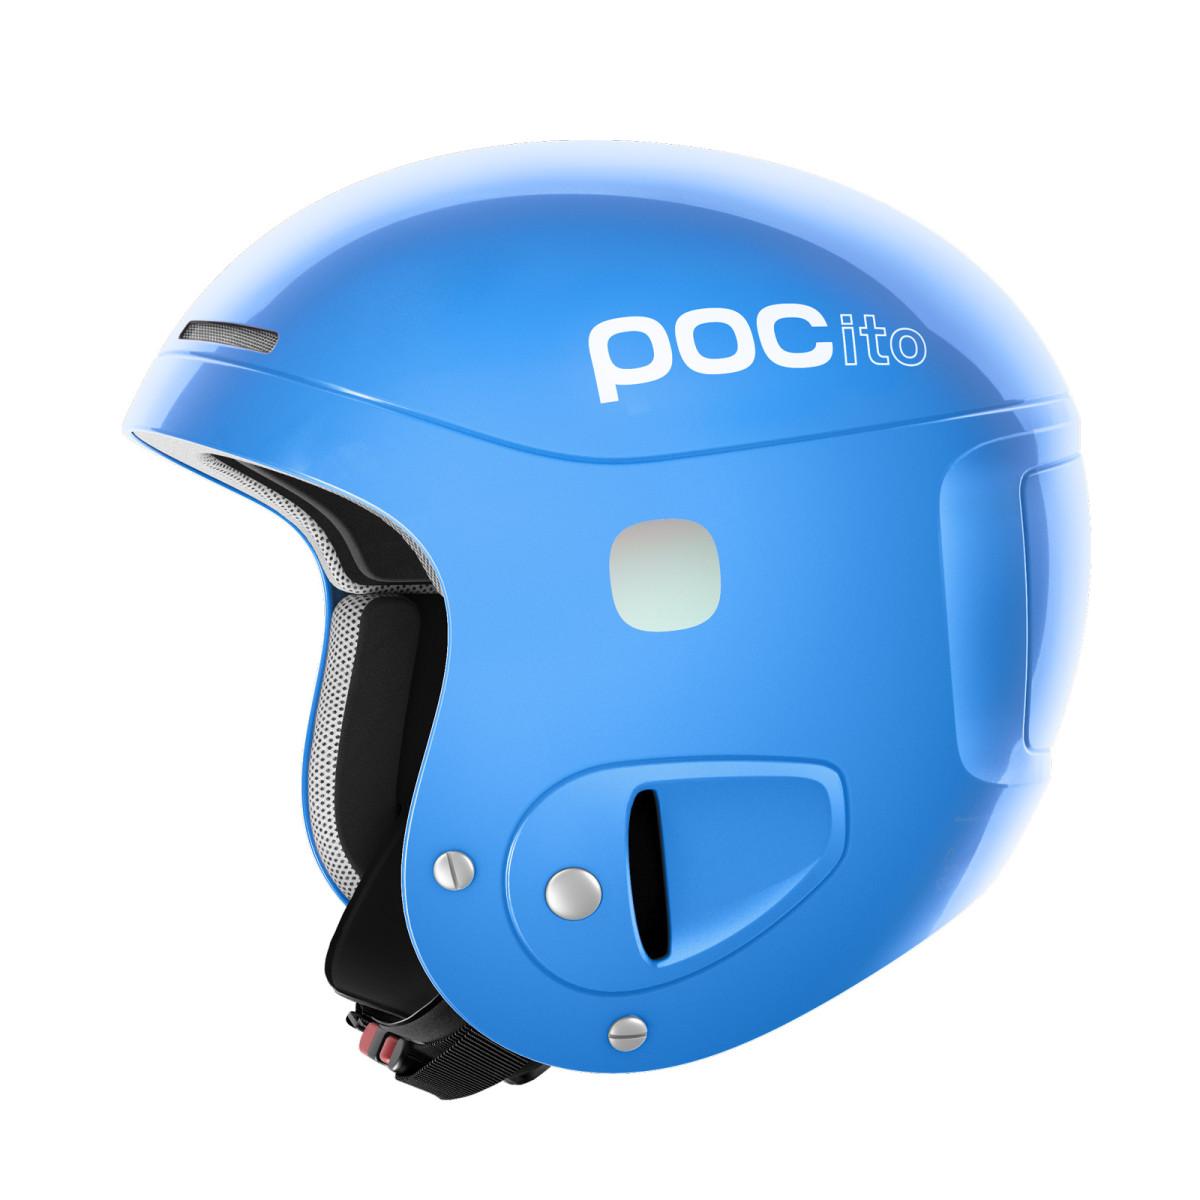 POC Pocito Skull - modrá Velikost helmy: XS/S 2019/2020